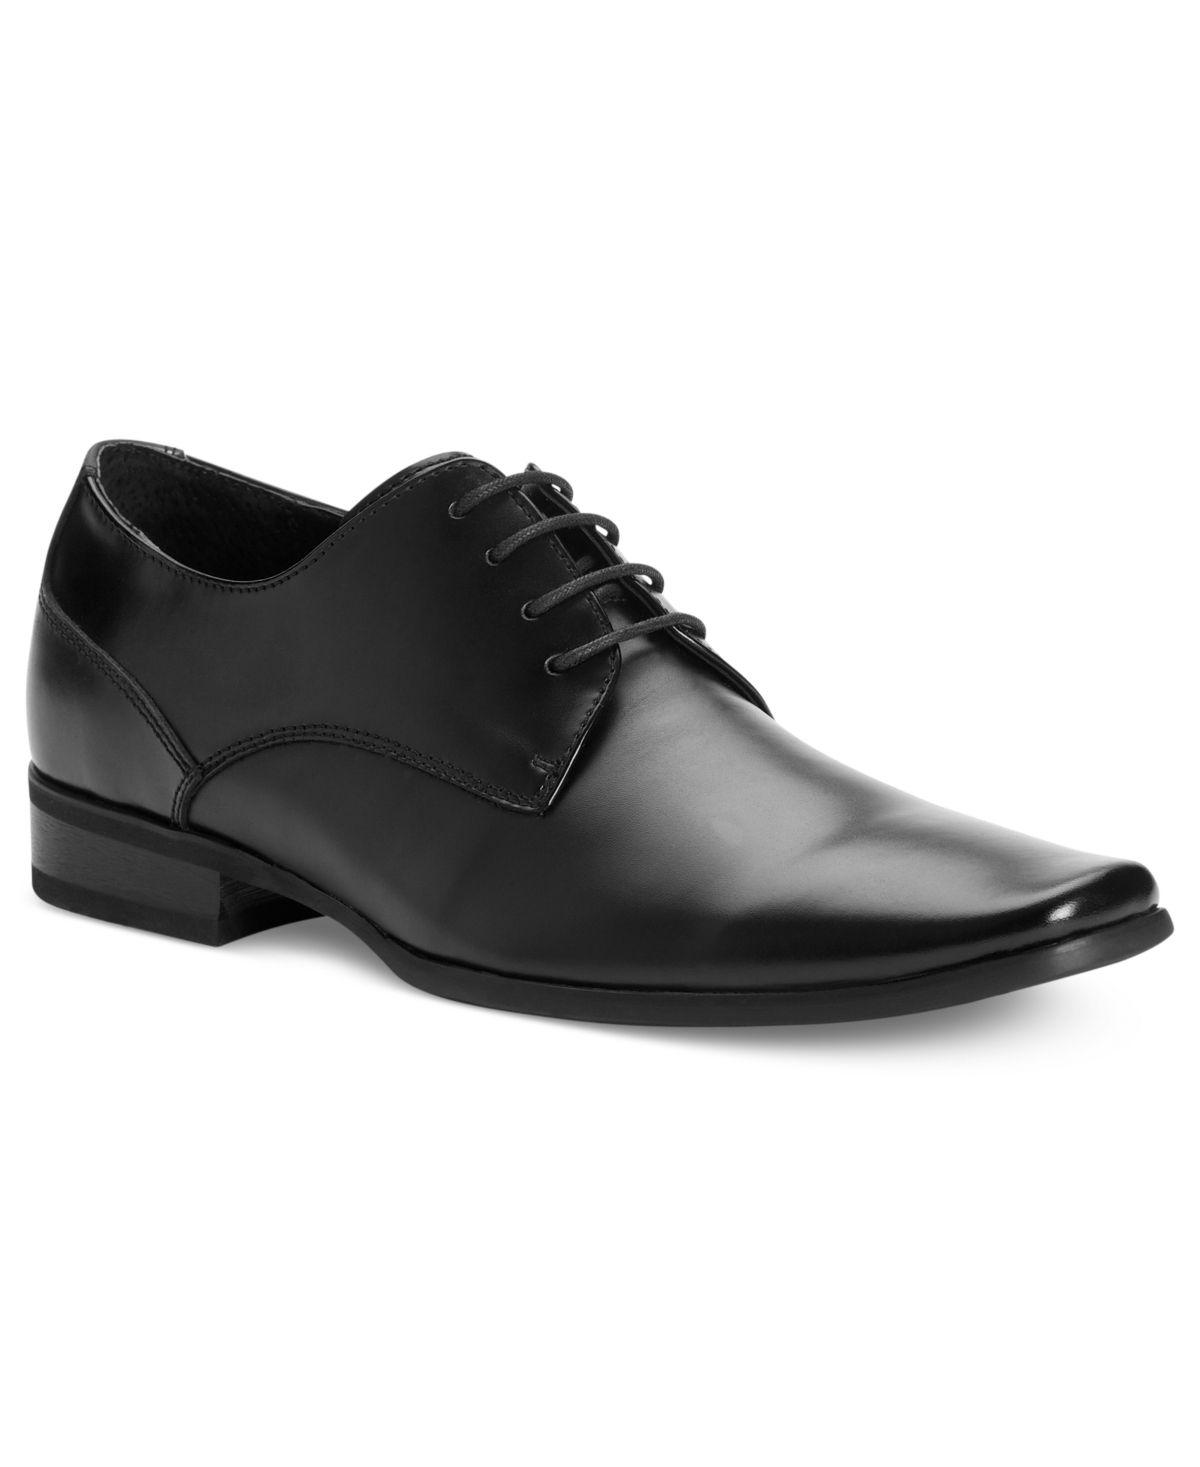 Stacy Adams Mens Black Calhoun Leather Formal Lace Up Trendy Dress Moc Toe Shoe